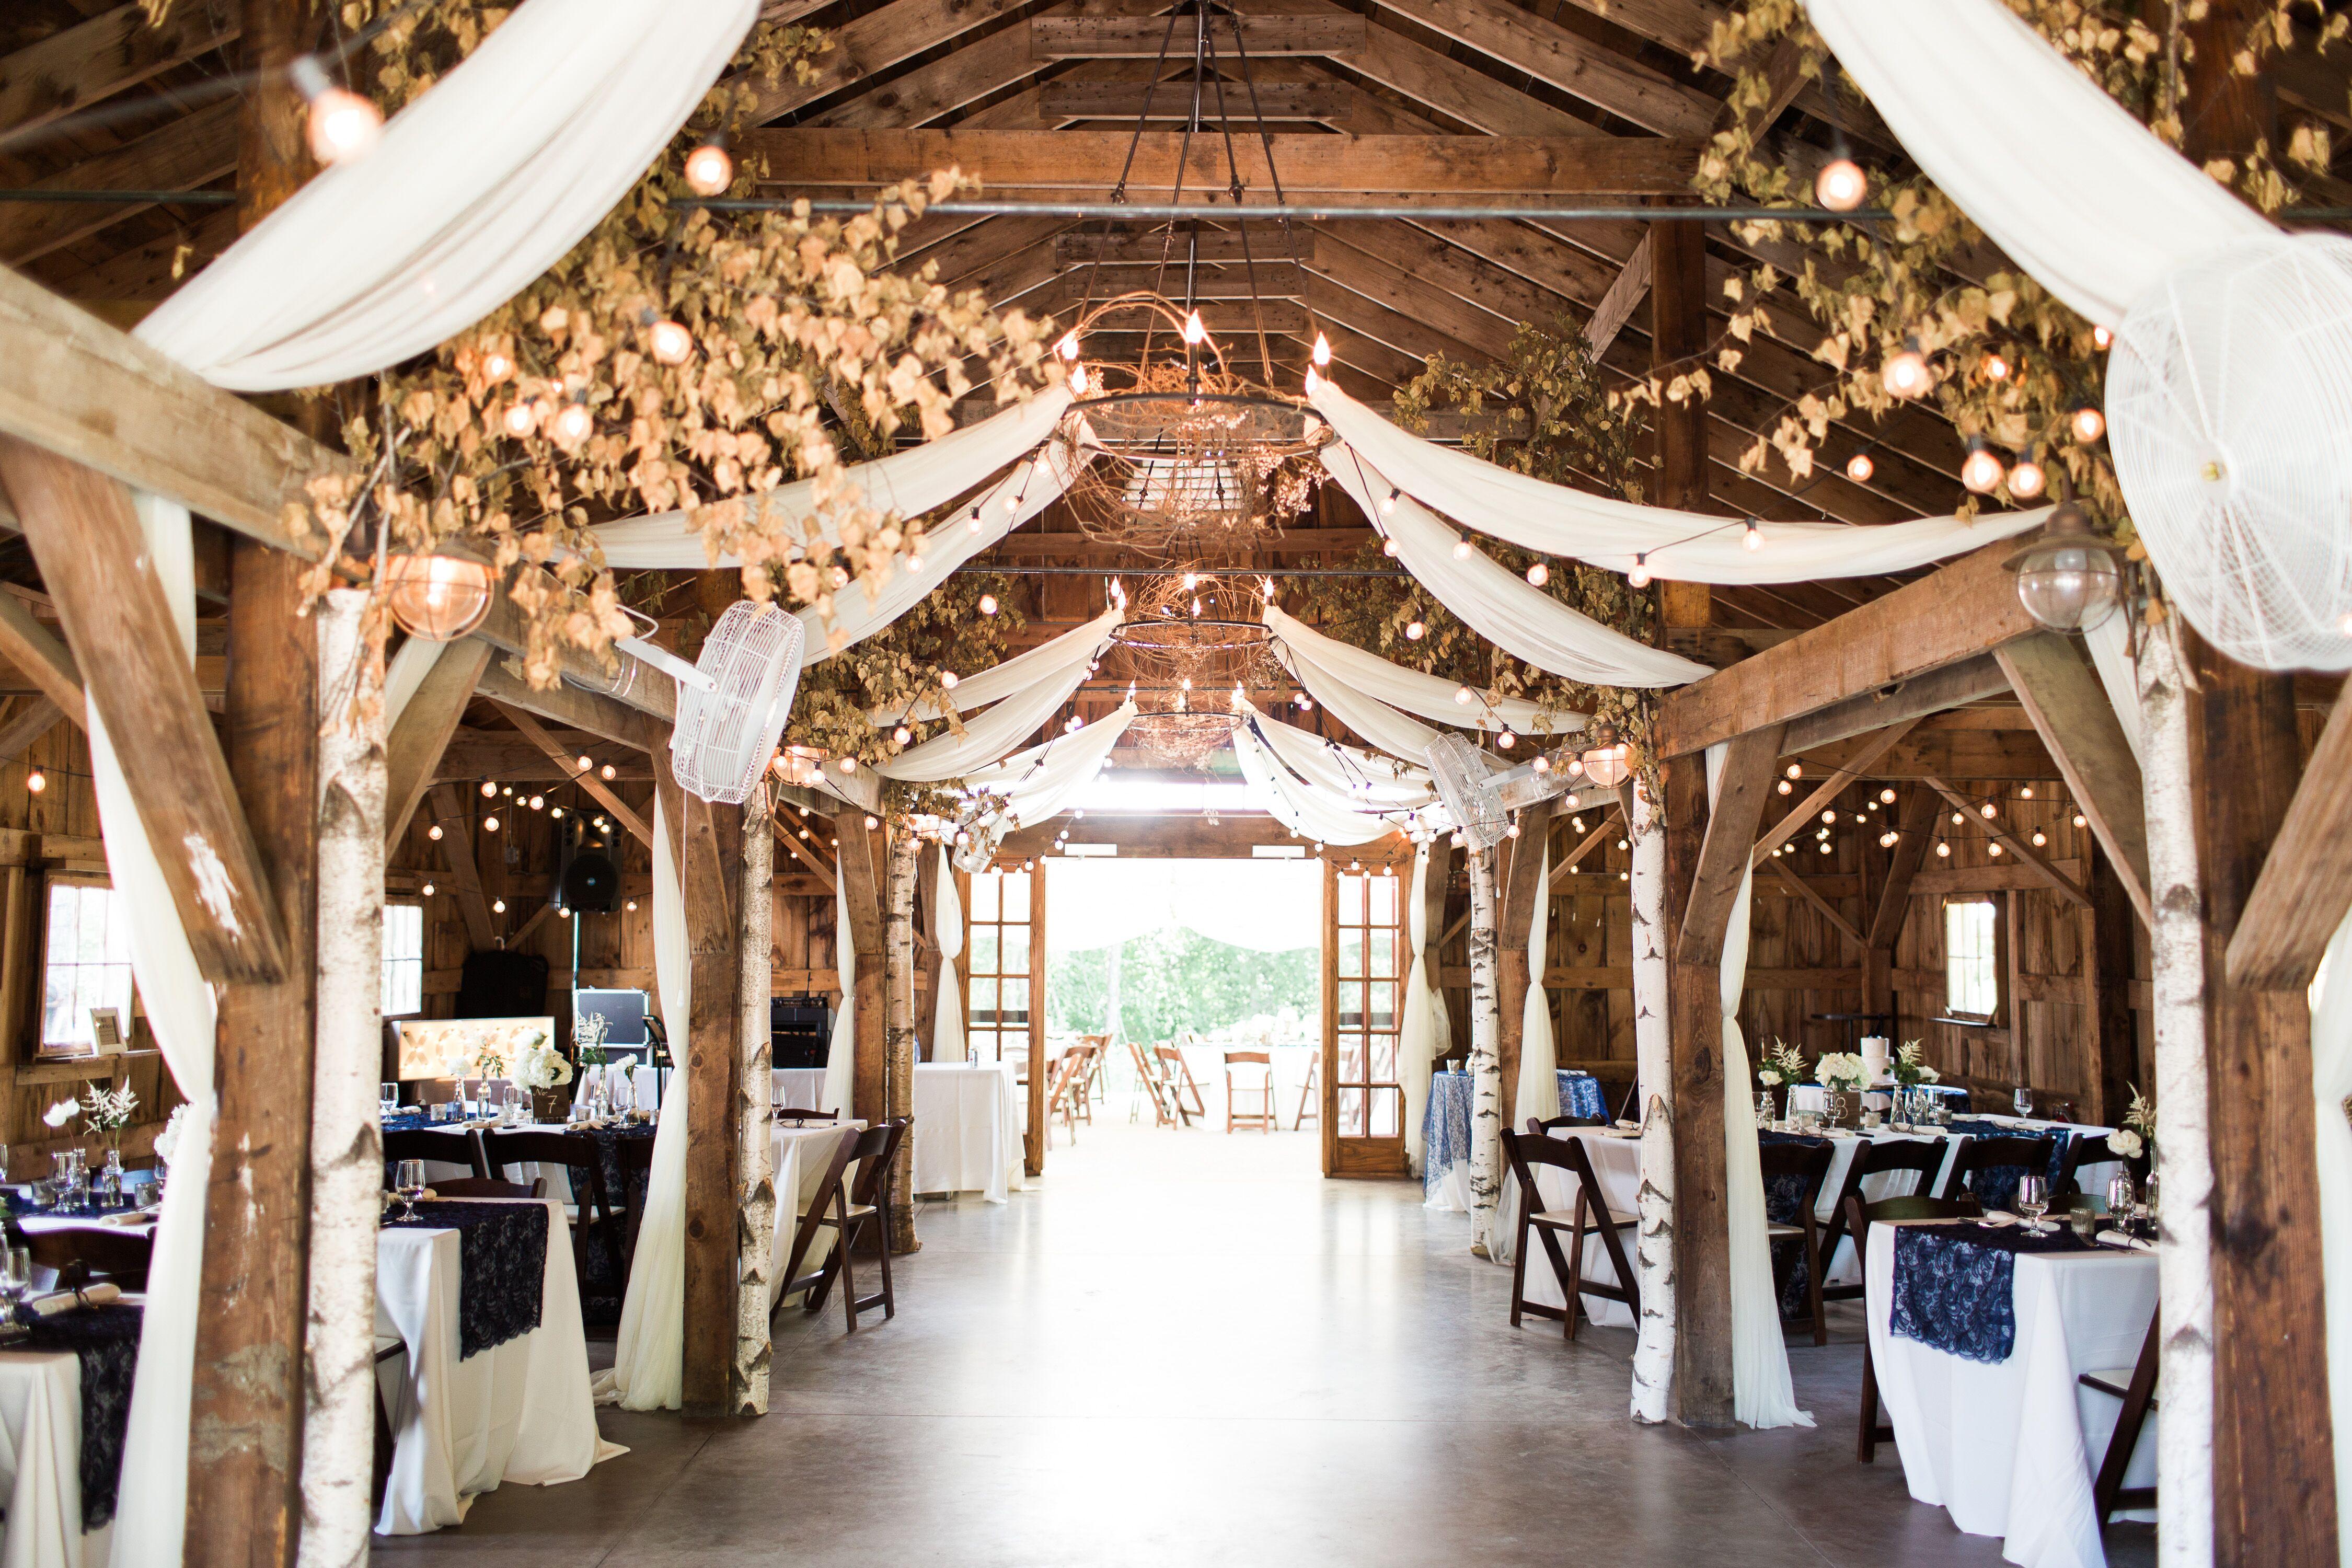 Elegant, Romantic Barn Reception at Longlook Farm